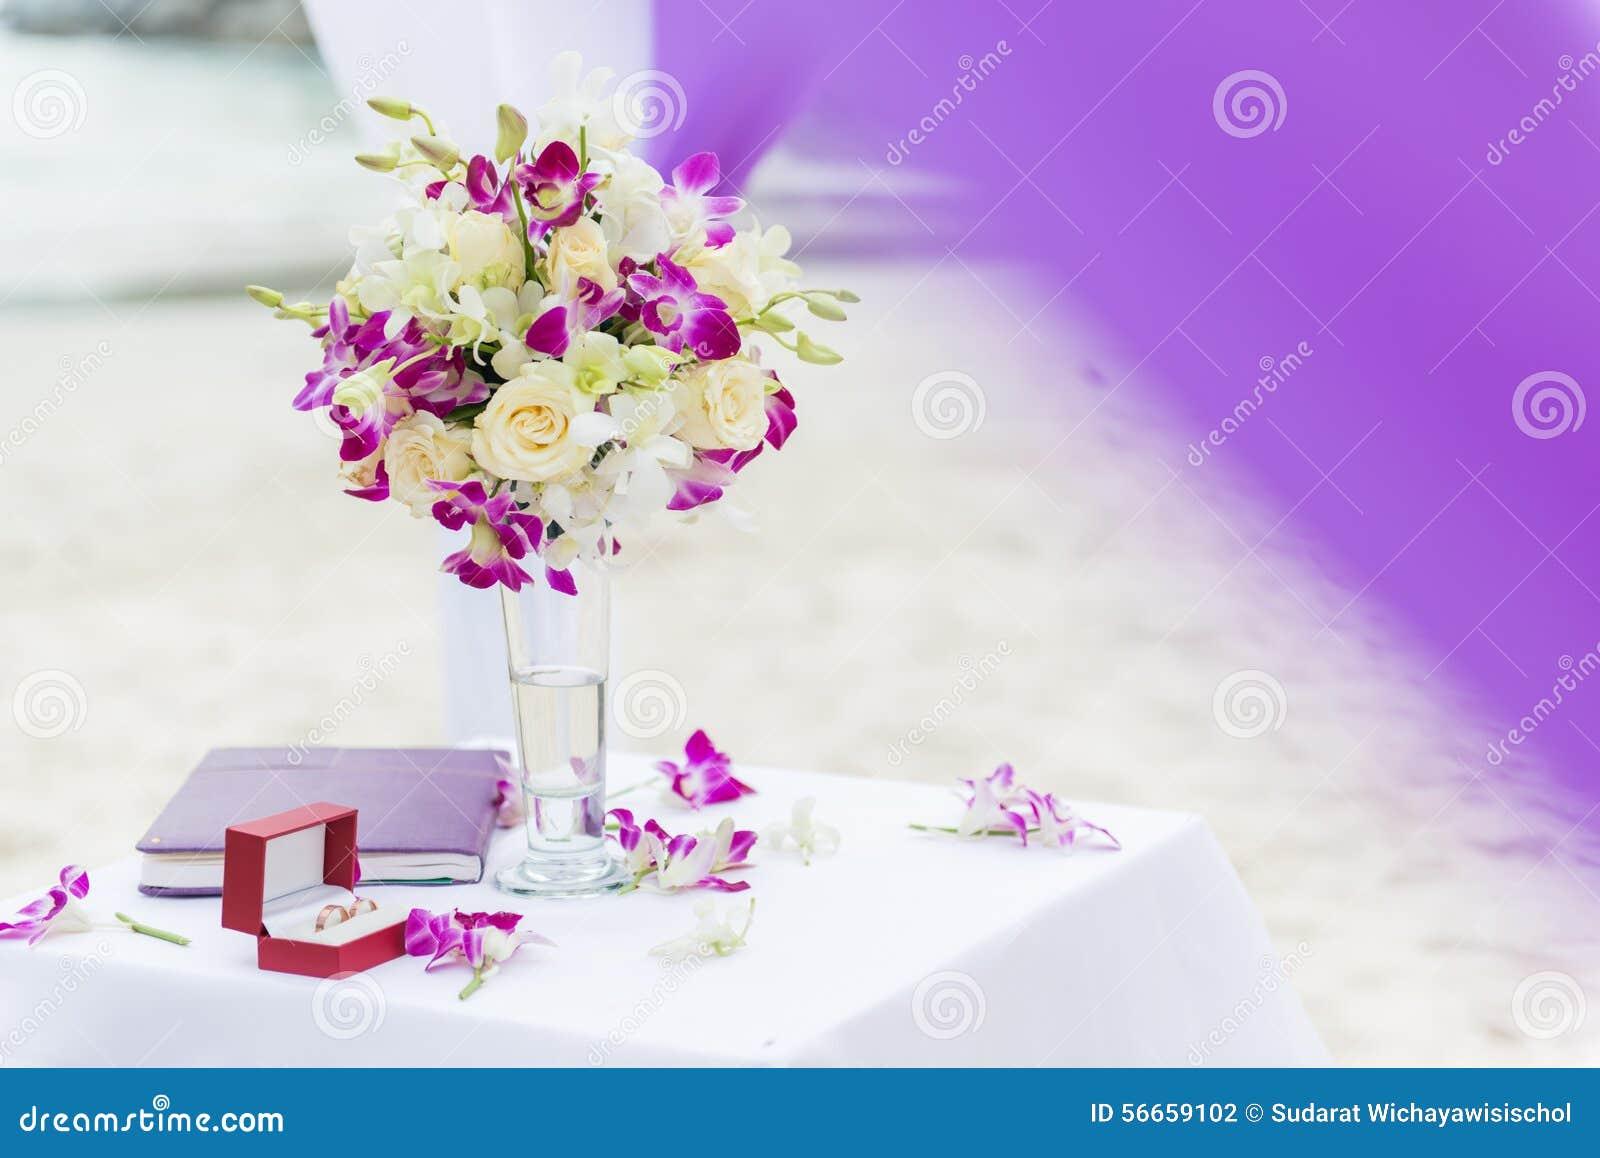 Wedding Flowers On Beach/wedding Venue Flowers Stock Photo - Image ...